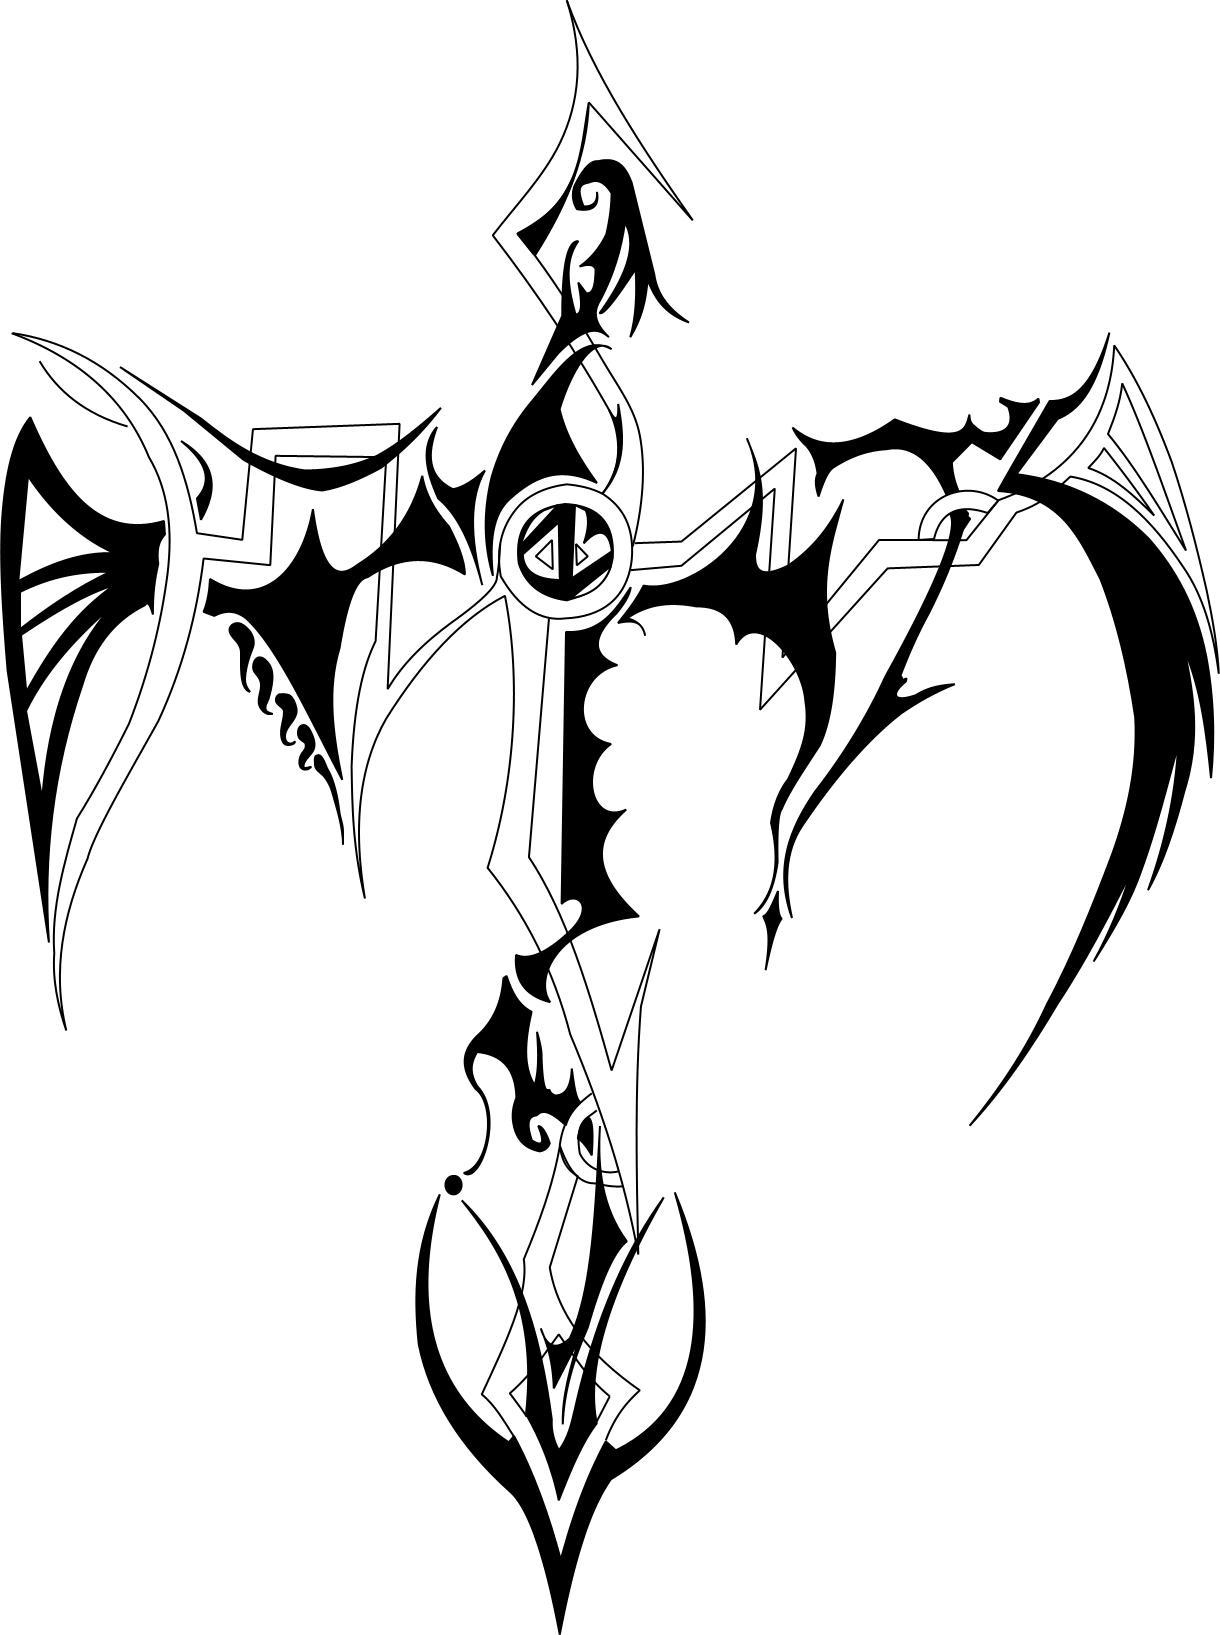 Tribal Cross Tattoo Outline